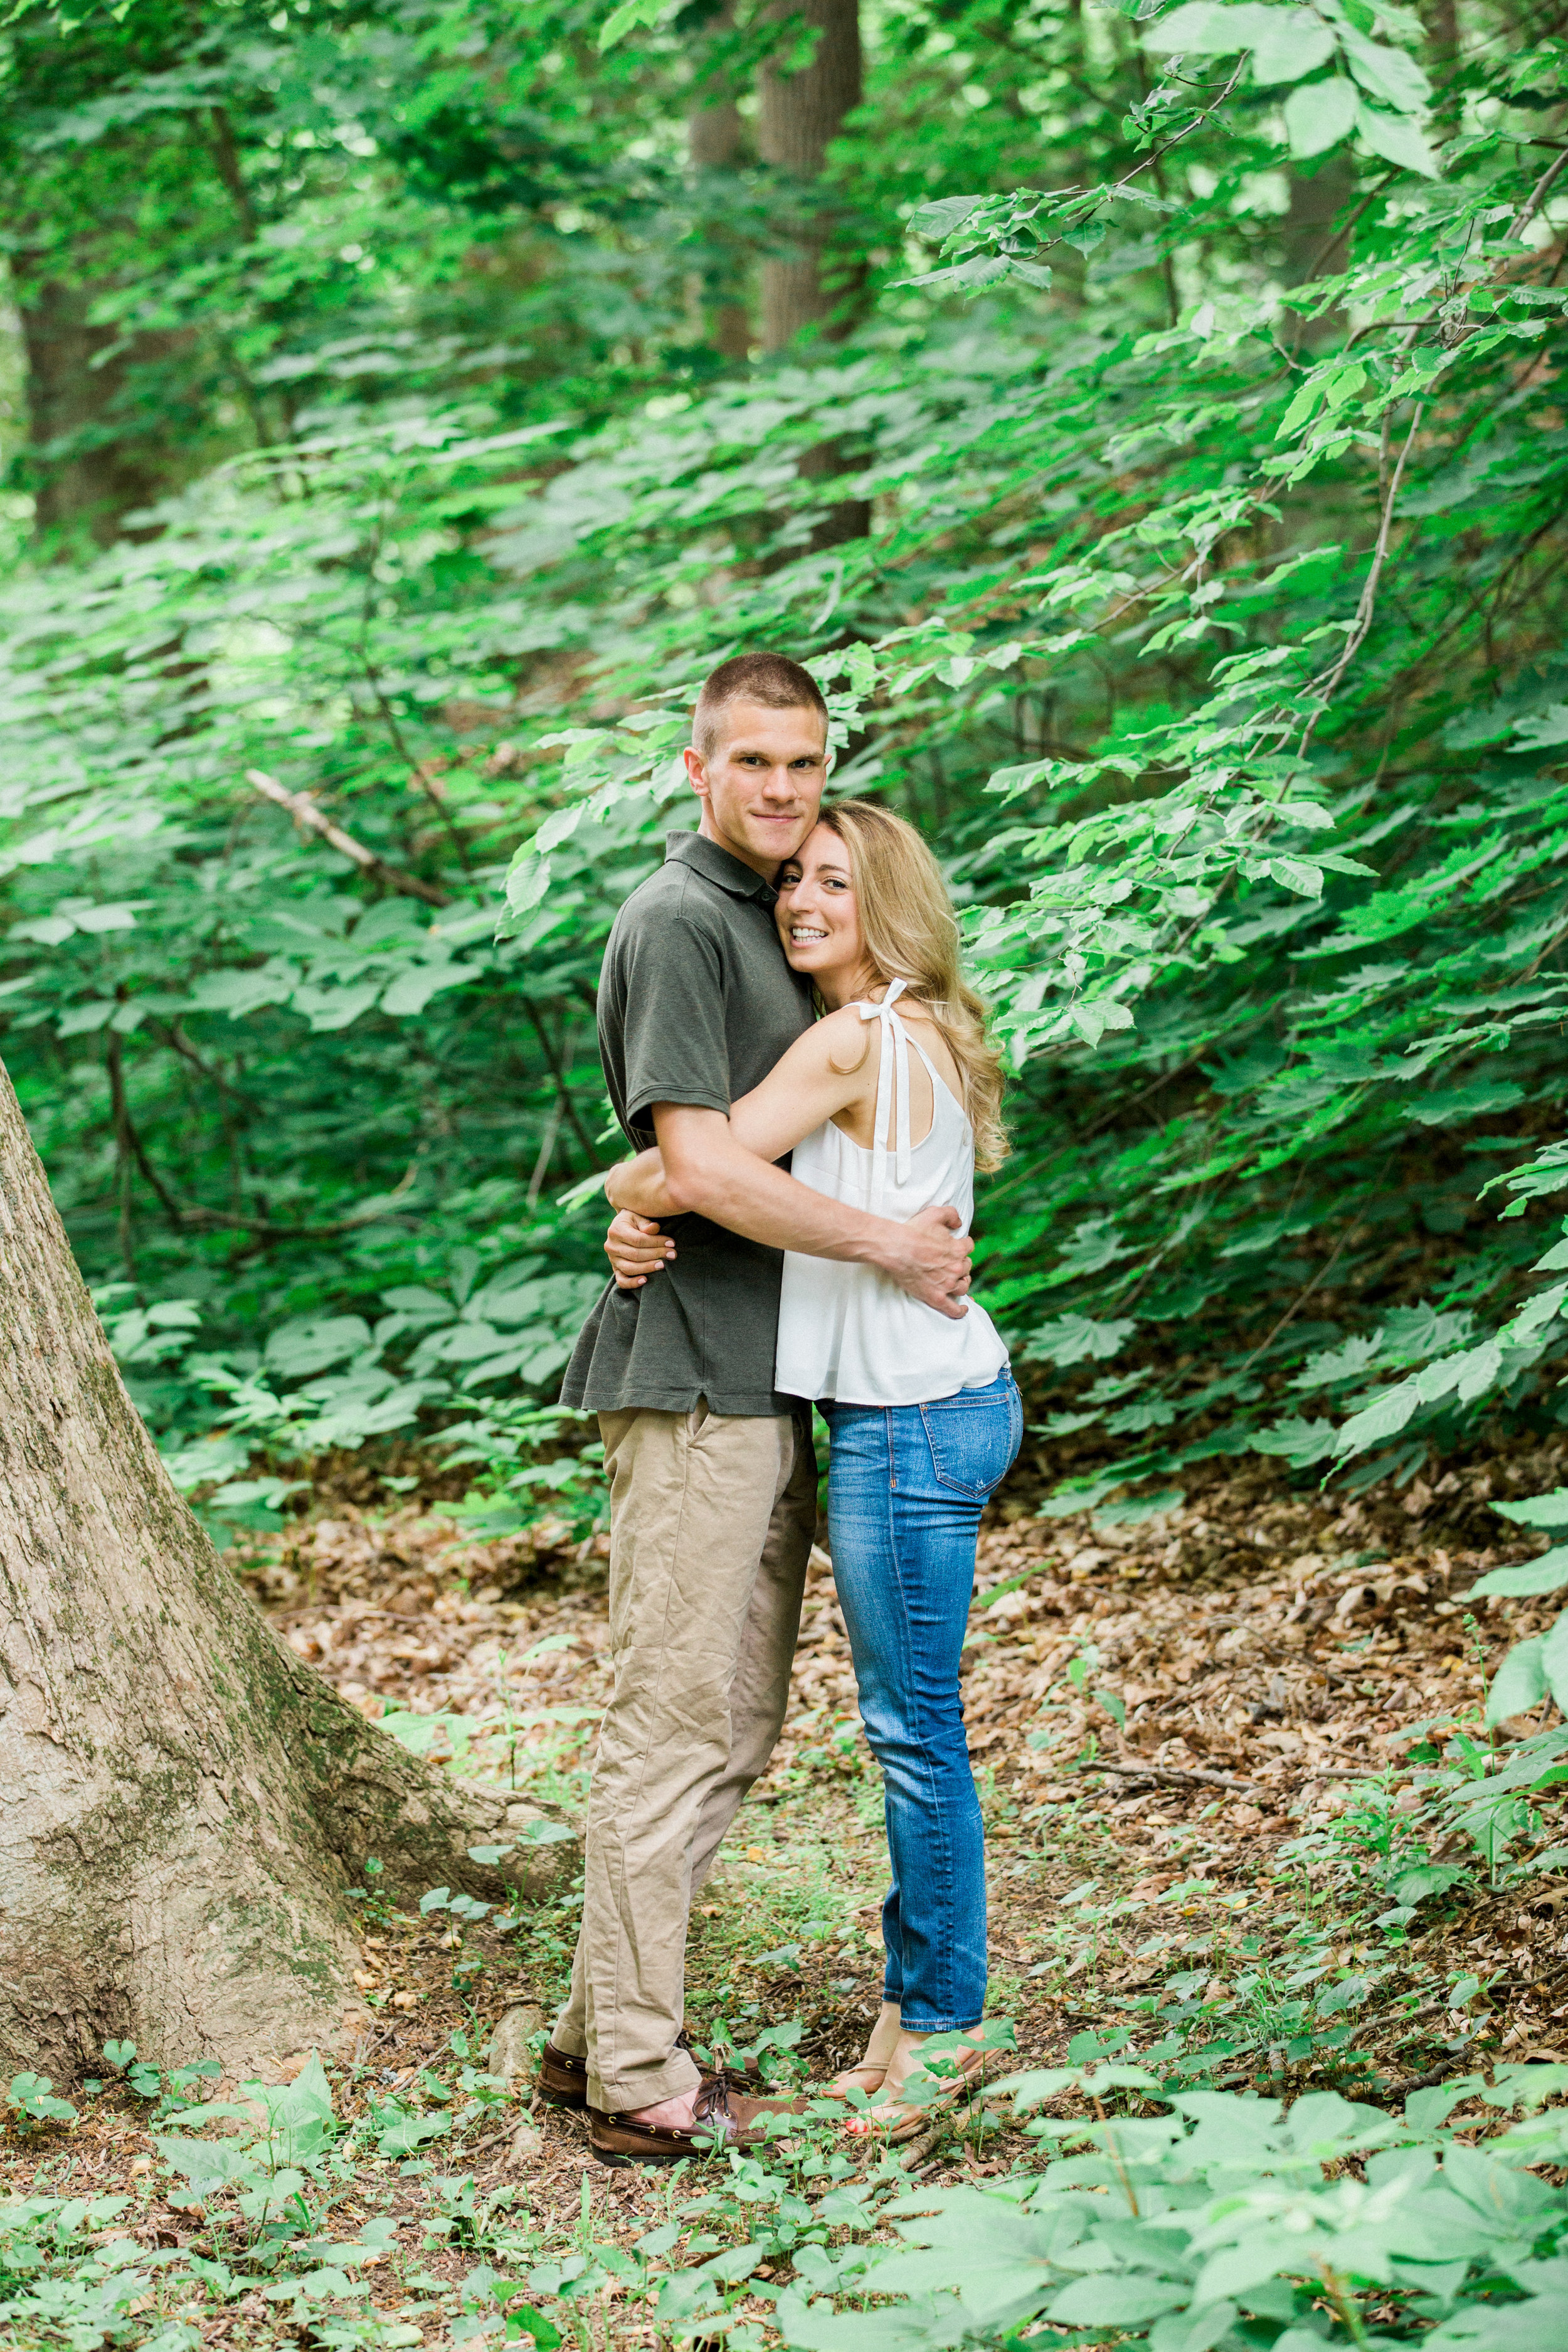 005-Wilmington-Delaware-Summer-Garden-Engagement-Emily-Andrew.jpg